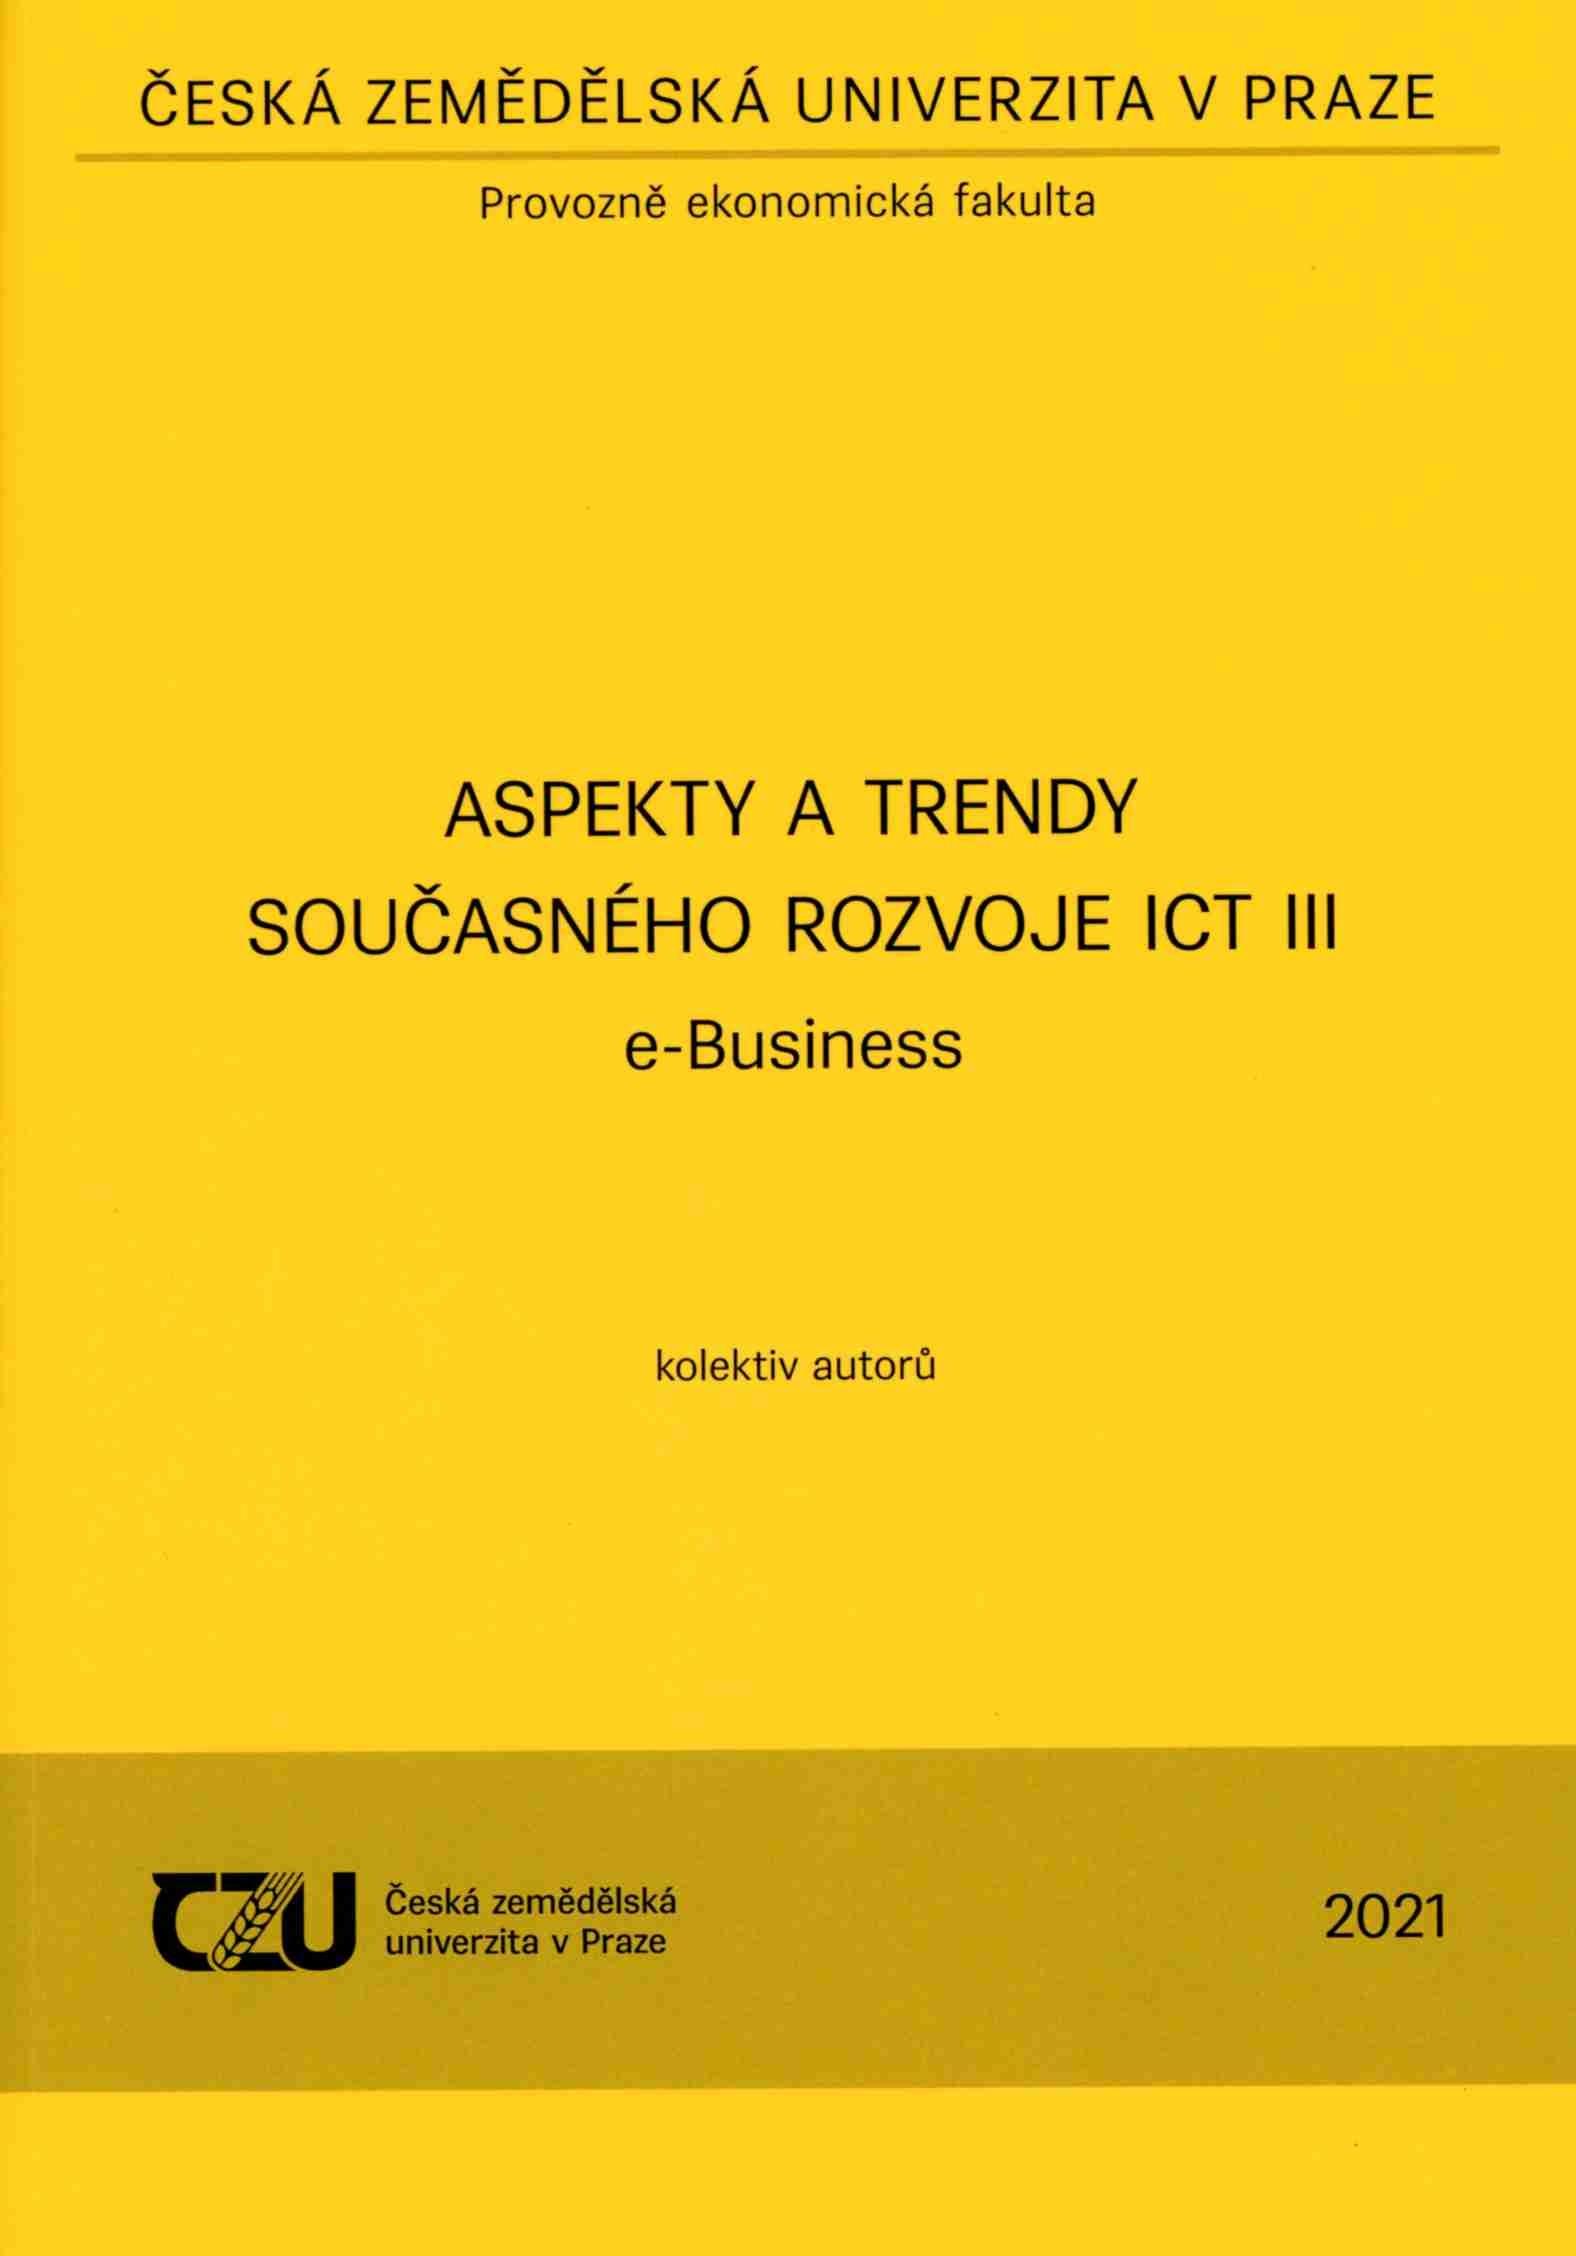 Aspekty a trendy současného rozvoje ICT III e-Business